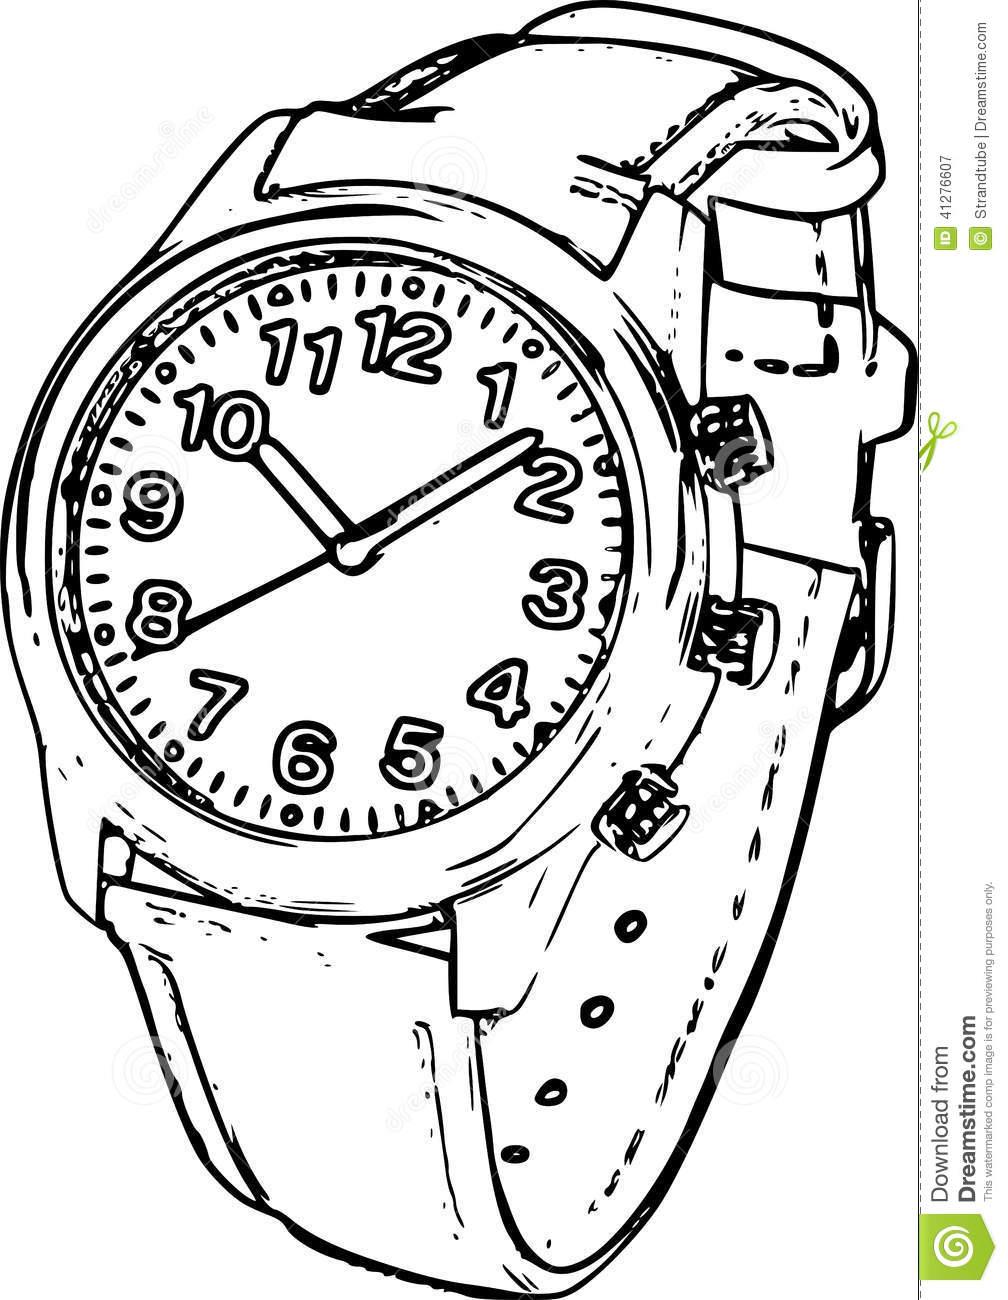 1008x1300 Line Drawing Wrist Watch Watch Technical Drawing